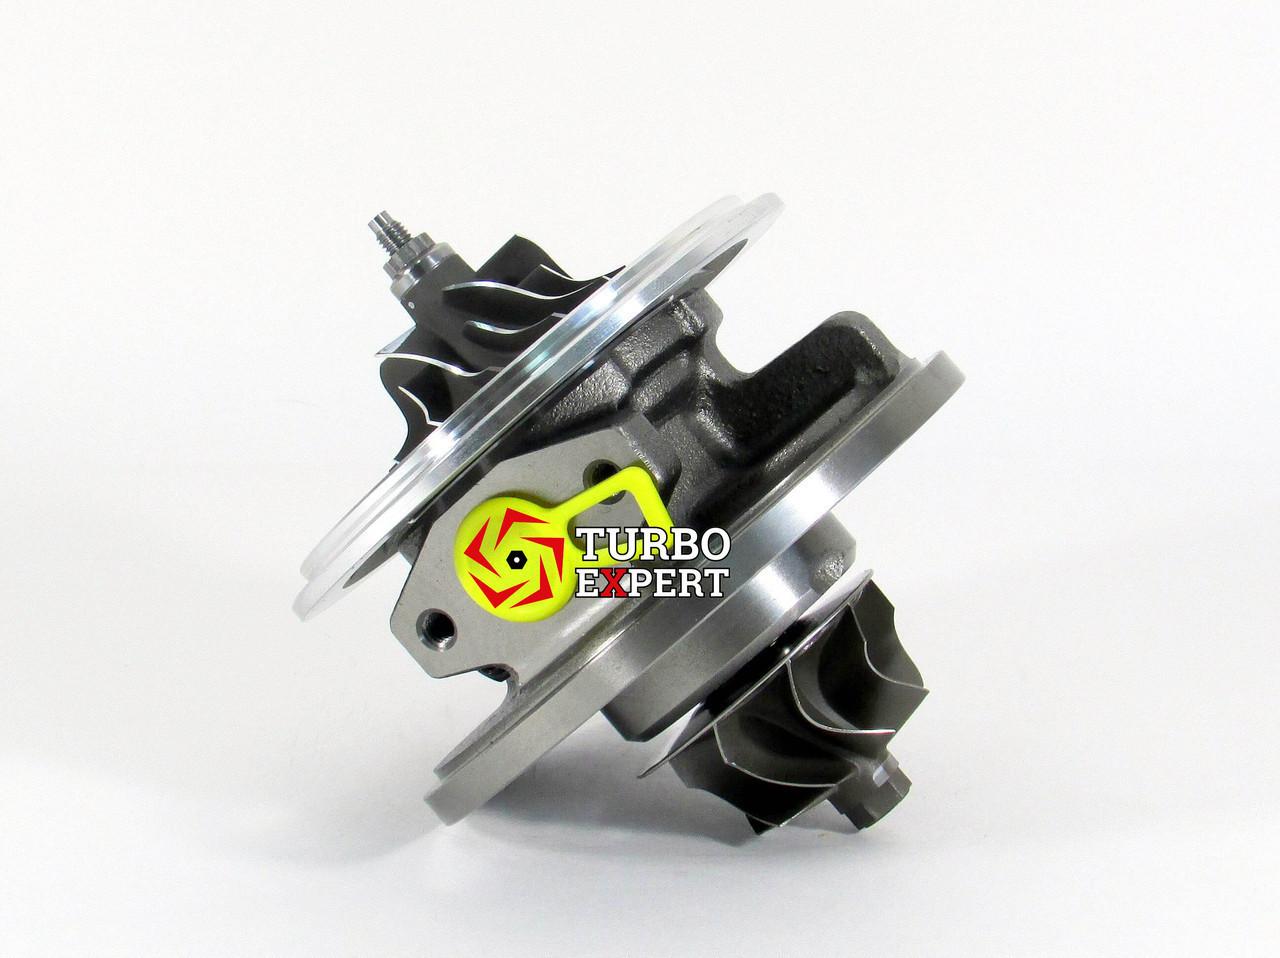 Картридж турбины 713673-5006S, Skoda Octavia I 1.9 TDI, 85 Kw, AUY/AJM, 038253019D, 038253019DX, 2000-2007